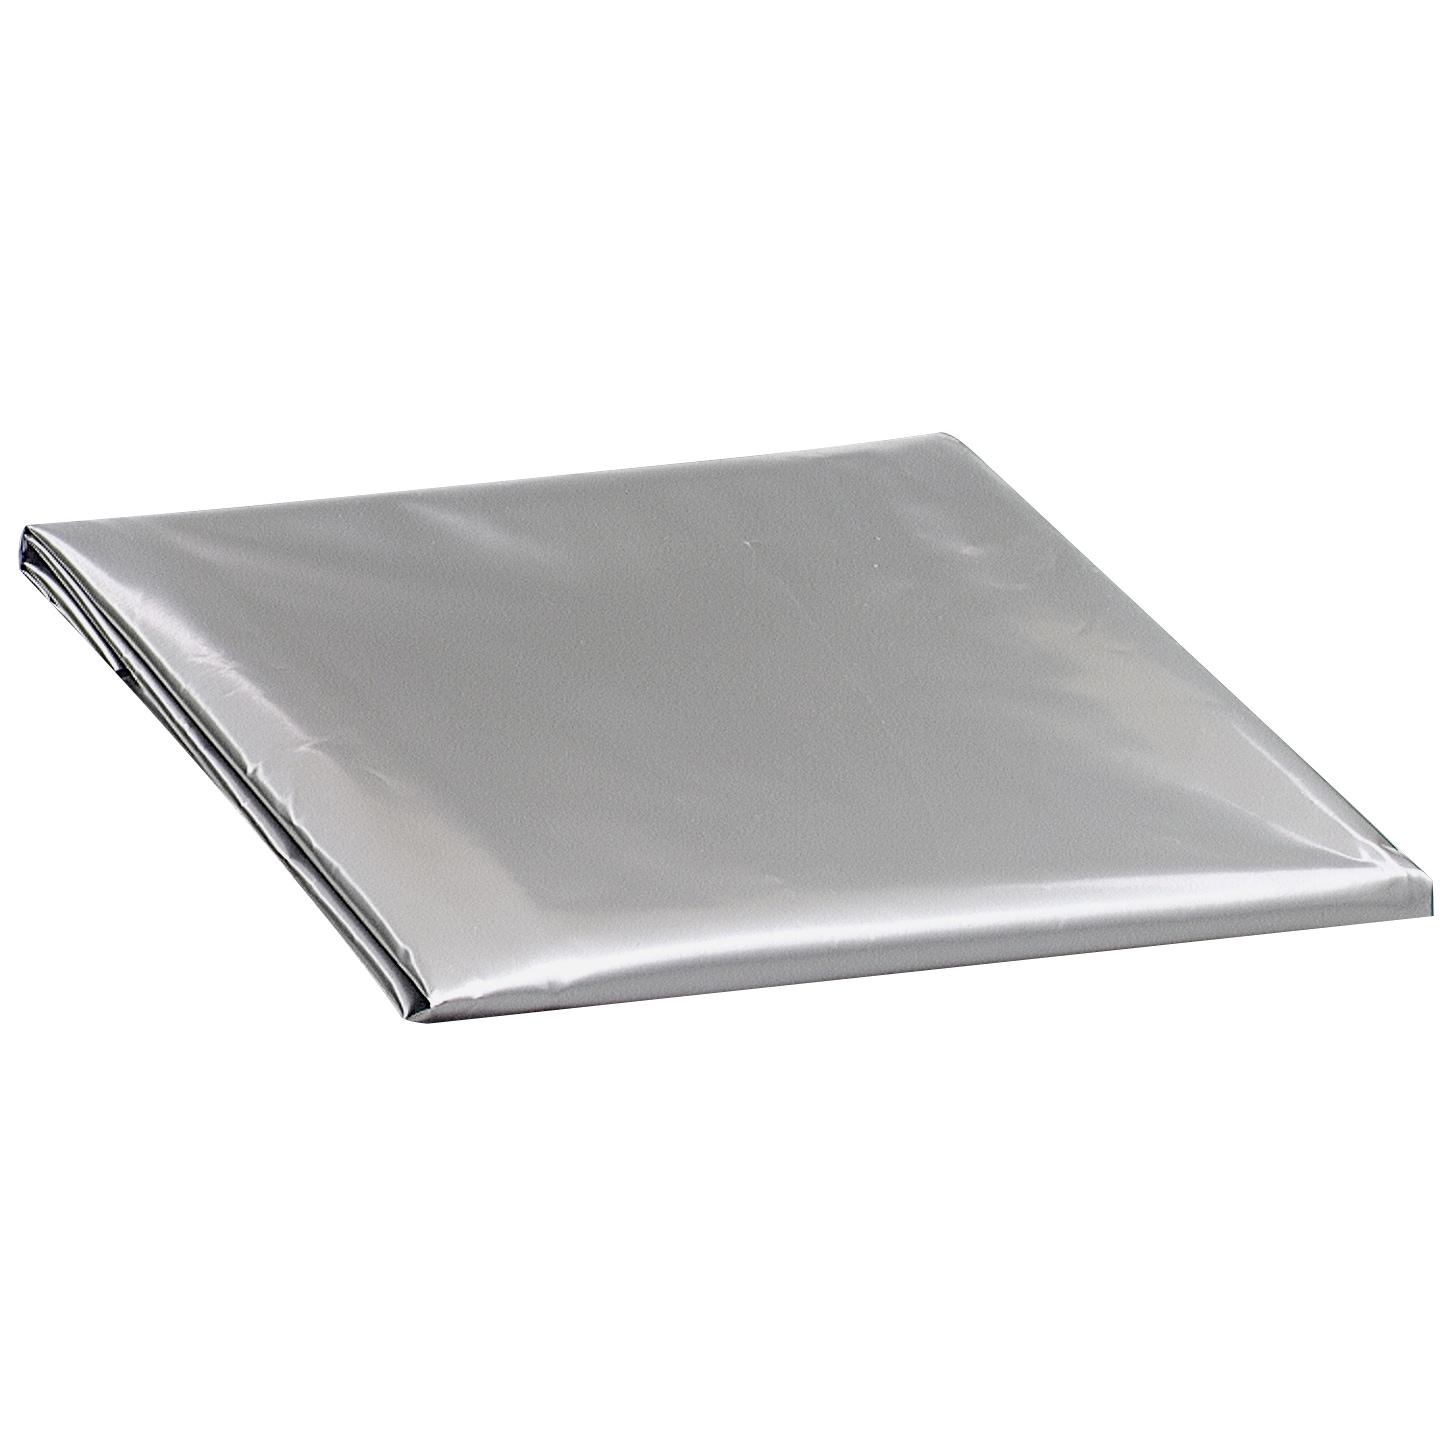 M-D 03392 Air Conditioner Cover (A/c Cover), Silver (Plas...